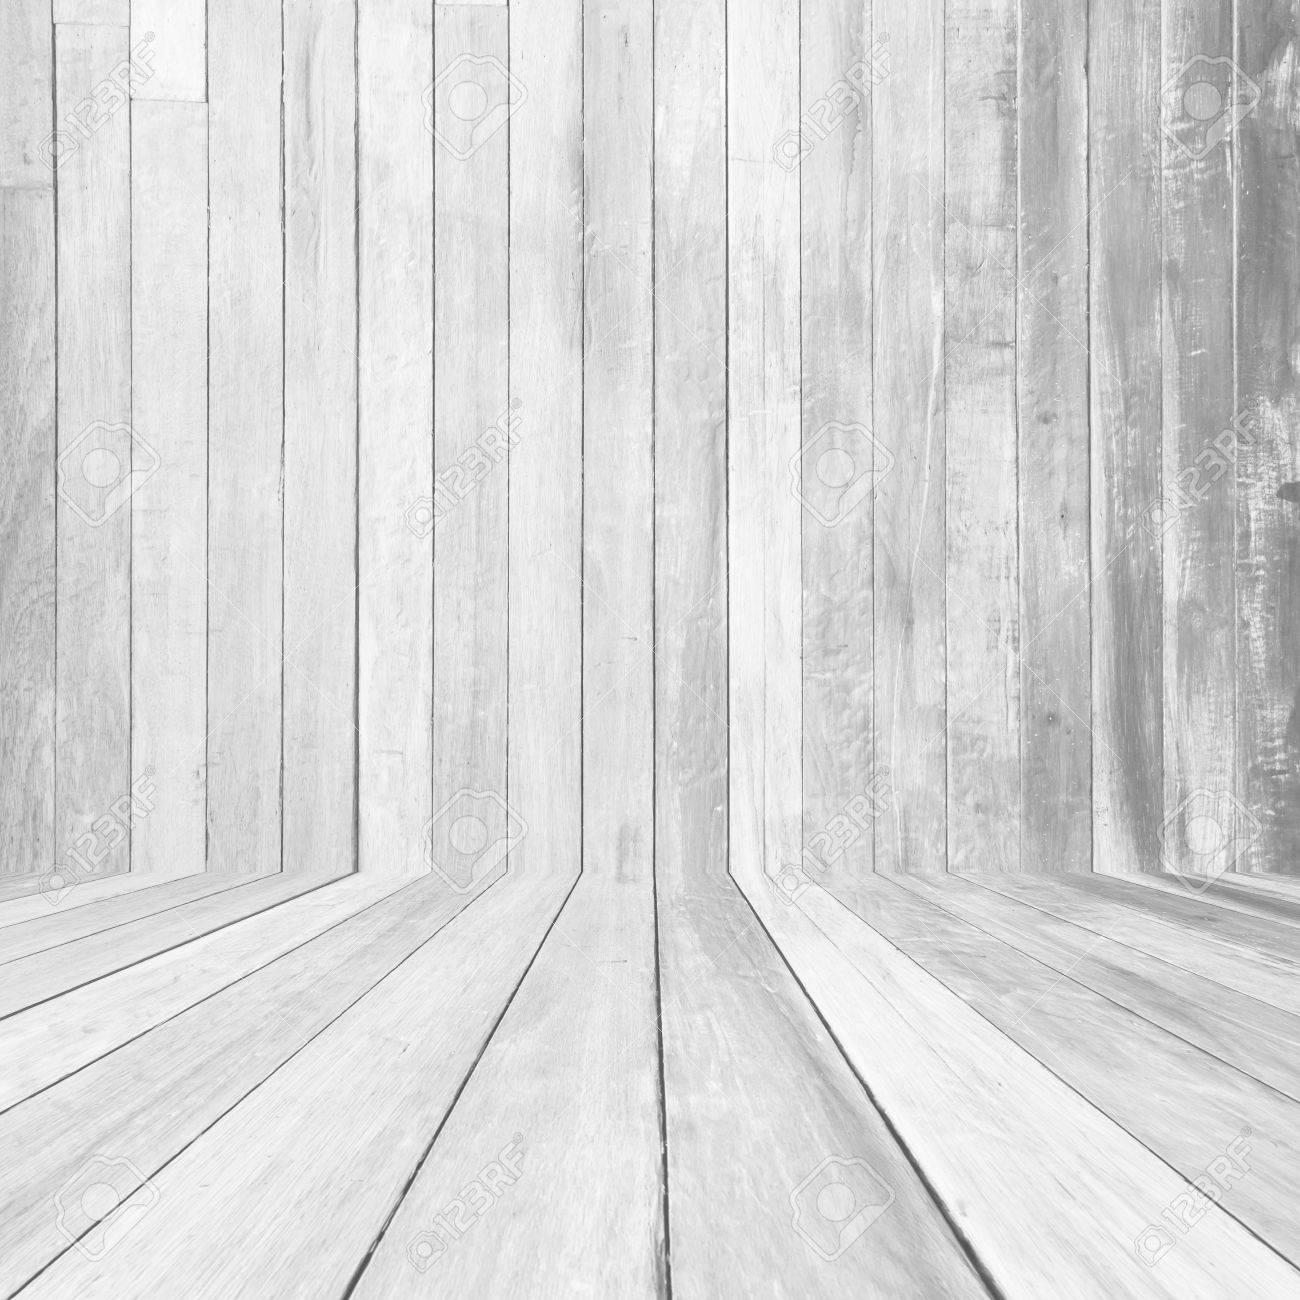 perspective white wood floor panel background stock photo 58822676